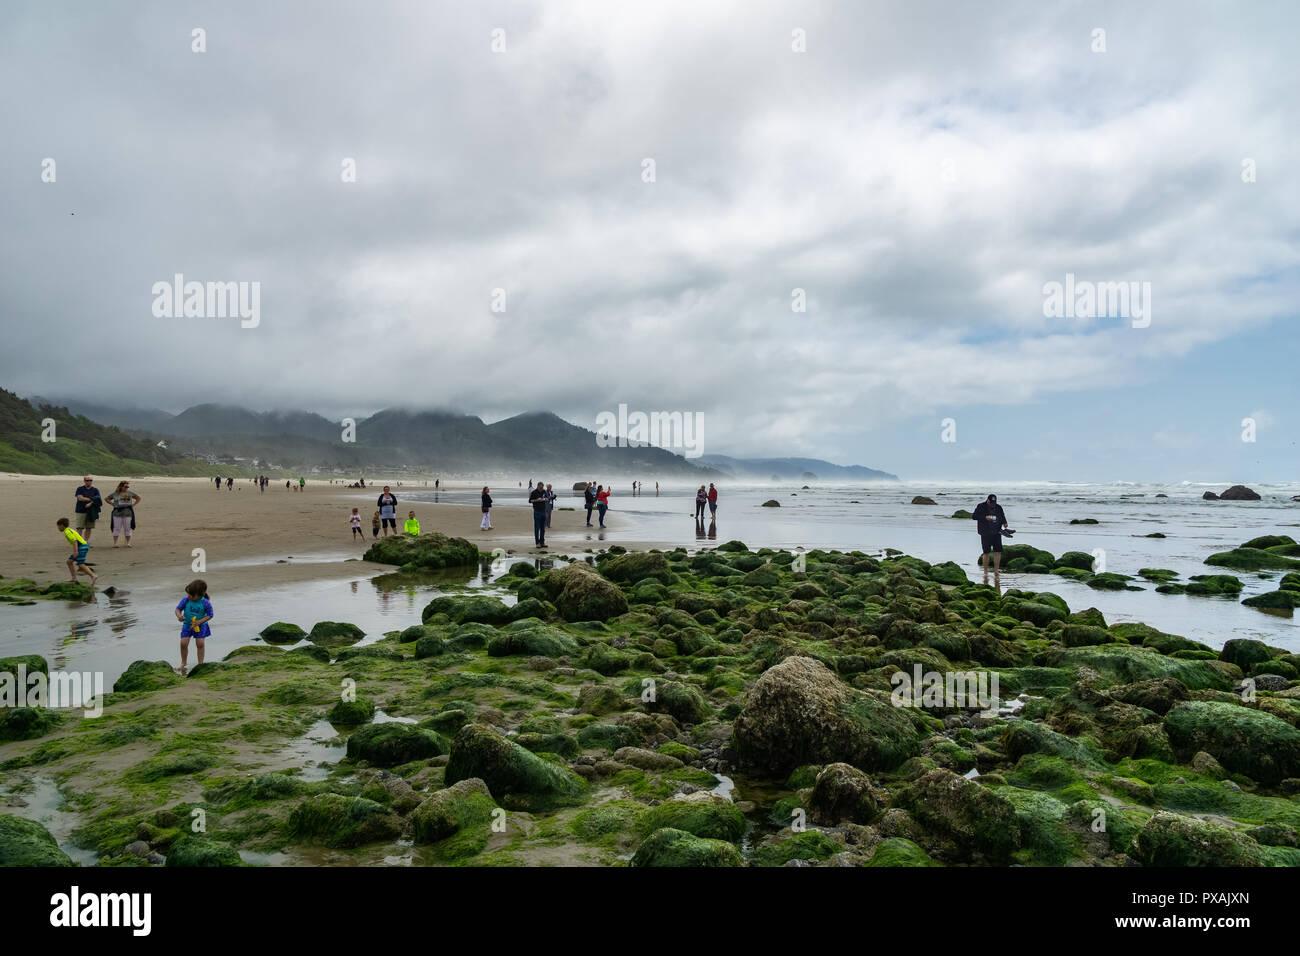 People or tourists enjoying Haystack Rock marine garden or tidepools at Cannon Beach, popular landmark of Oregon Coast, USA. - Stock Image